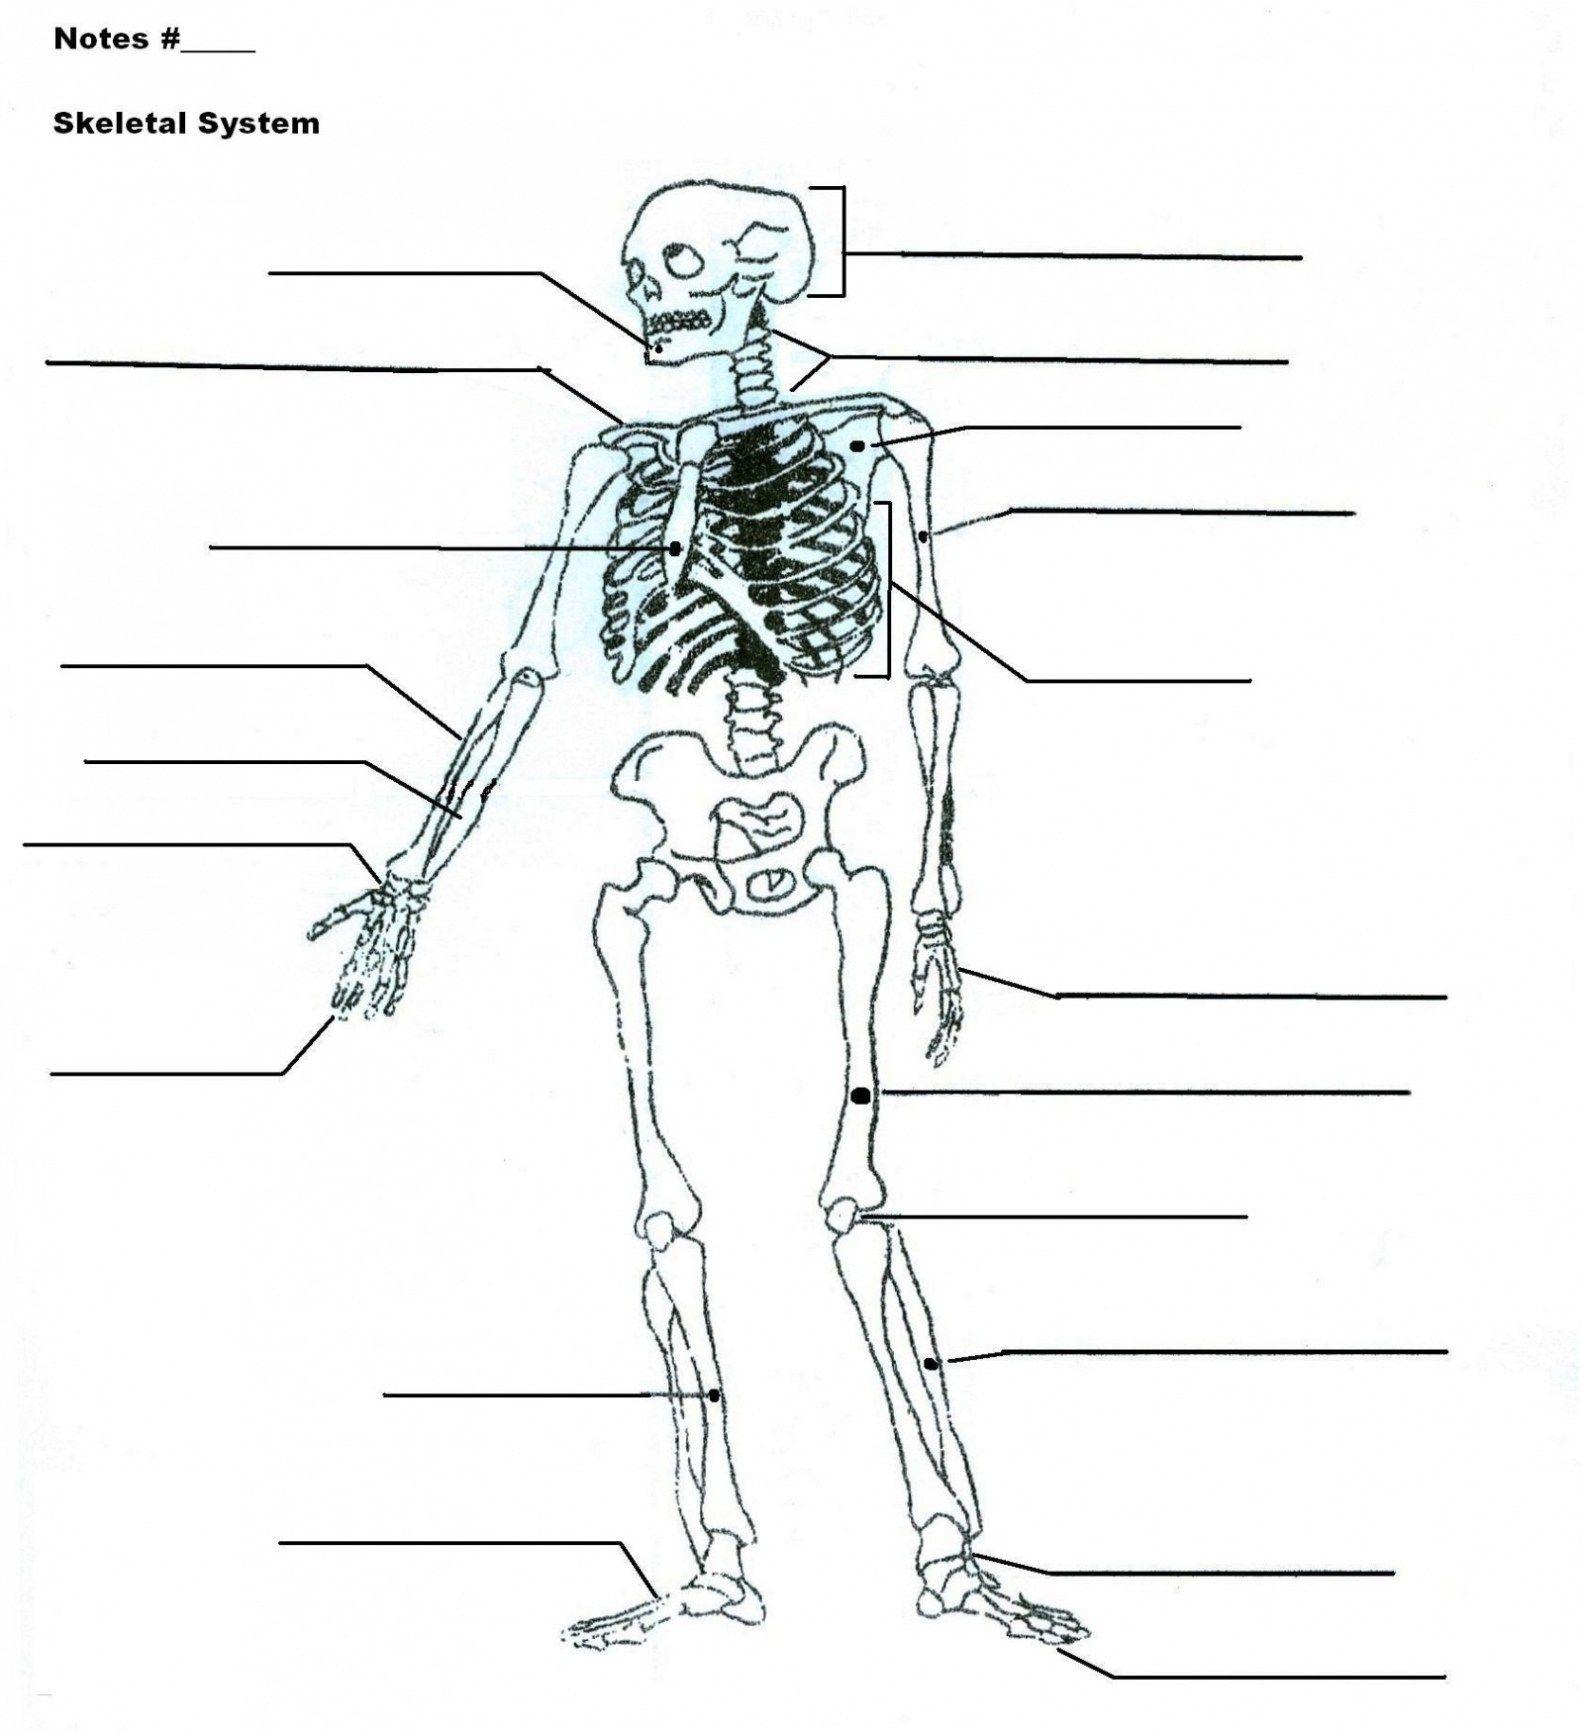 medium resolution of human skeleton diagram unlabeled human skeleton diagram unlabeled unlabeled skull diagram daytonva150